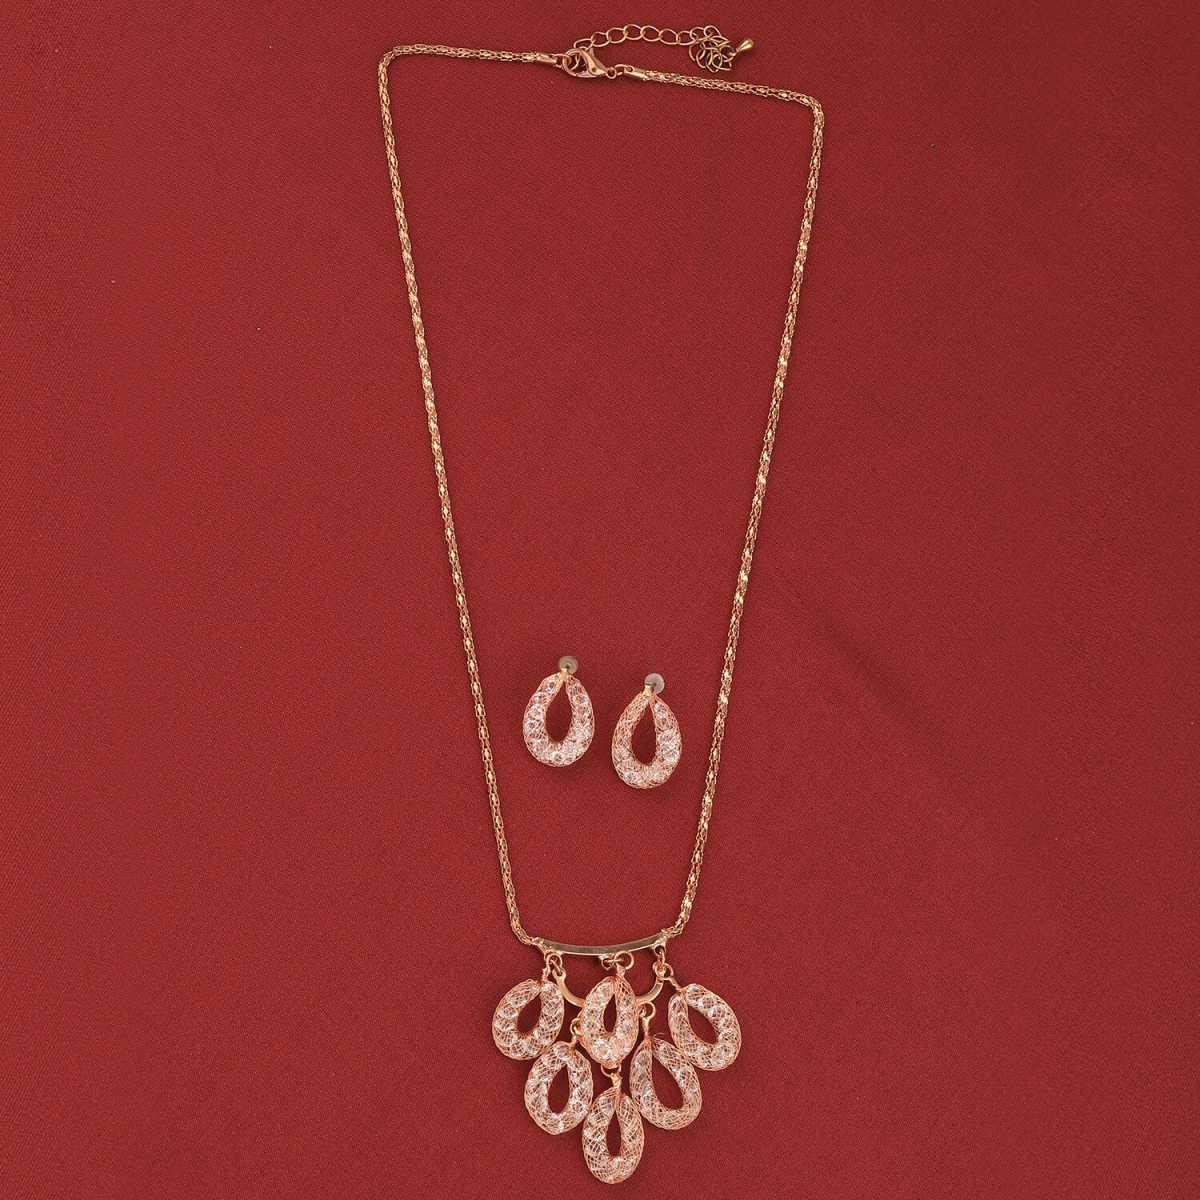 SILVER SHINE Charm Party Wear Different Designe Pendant Set For Women Girl